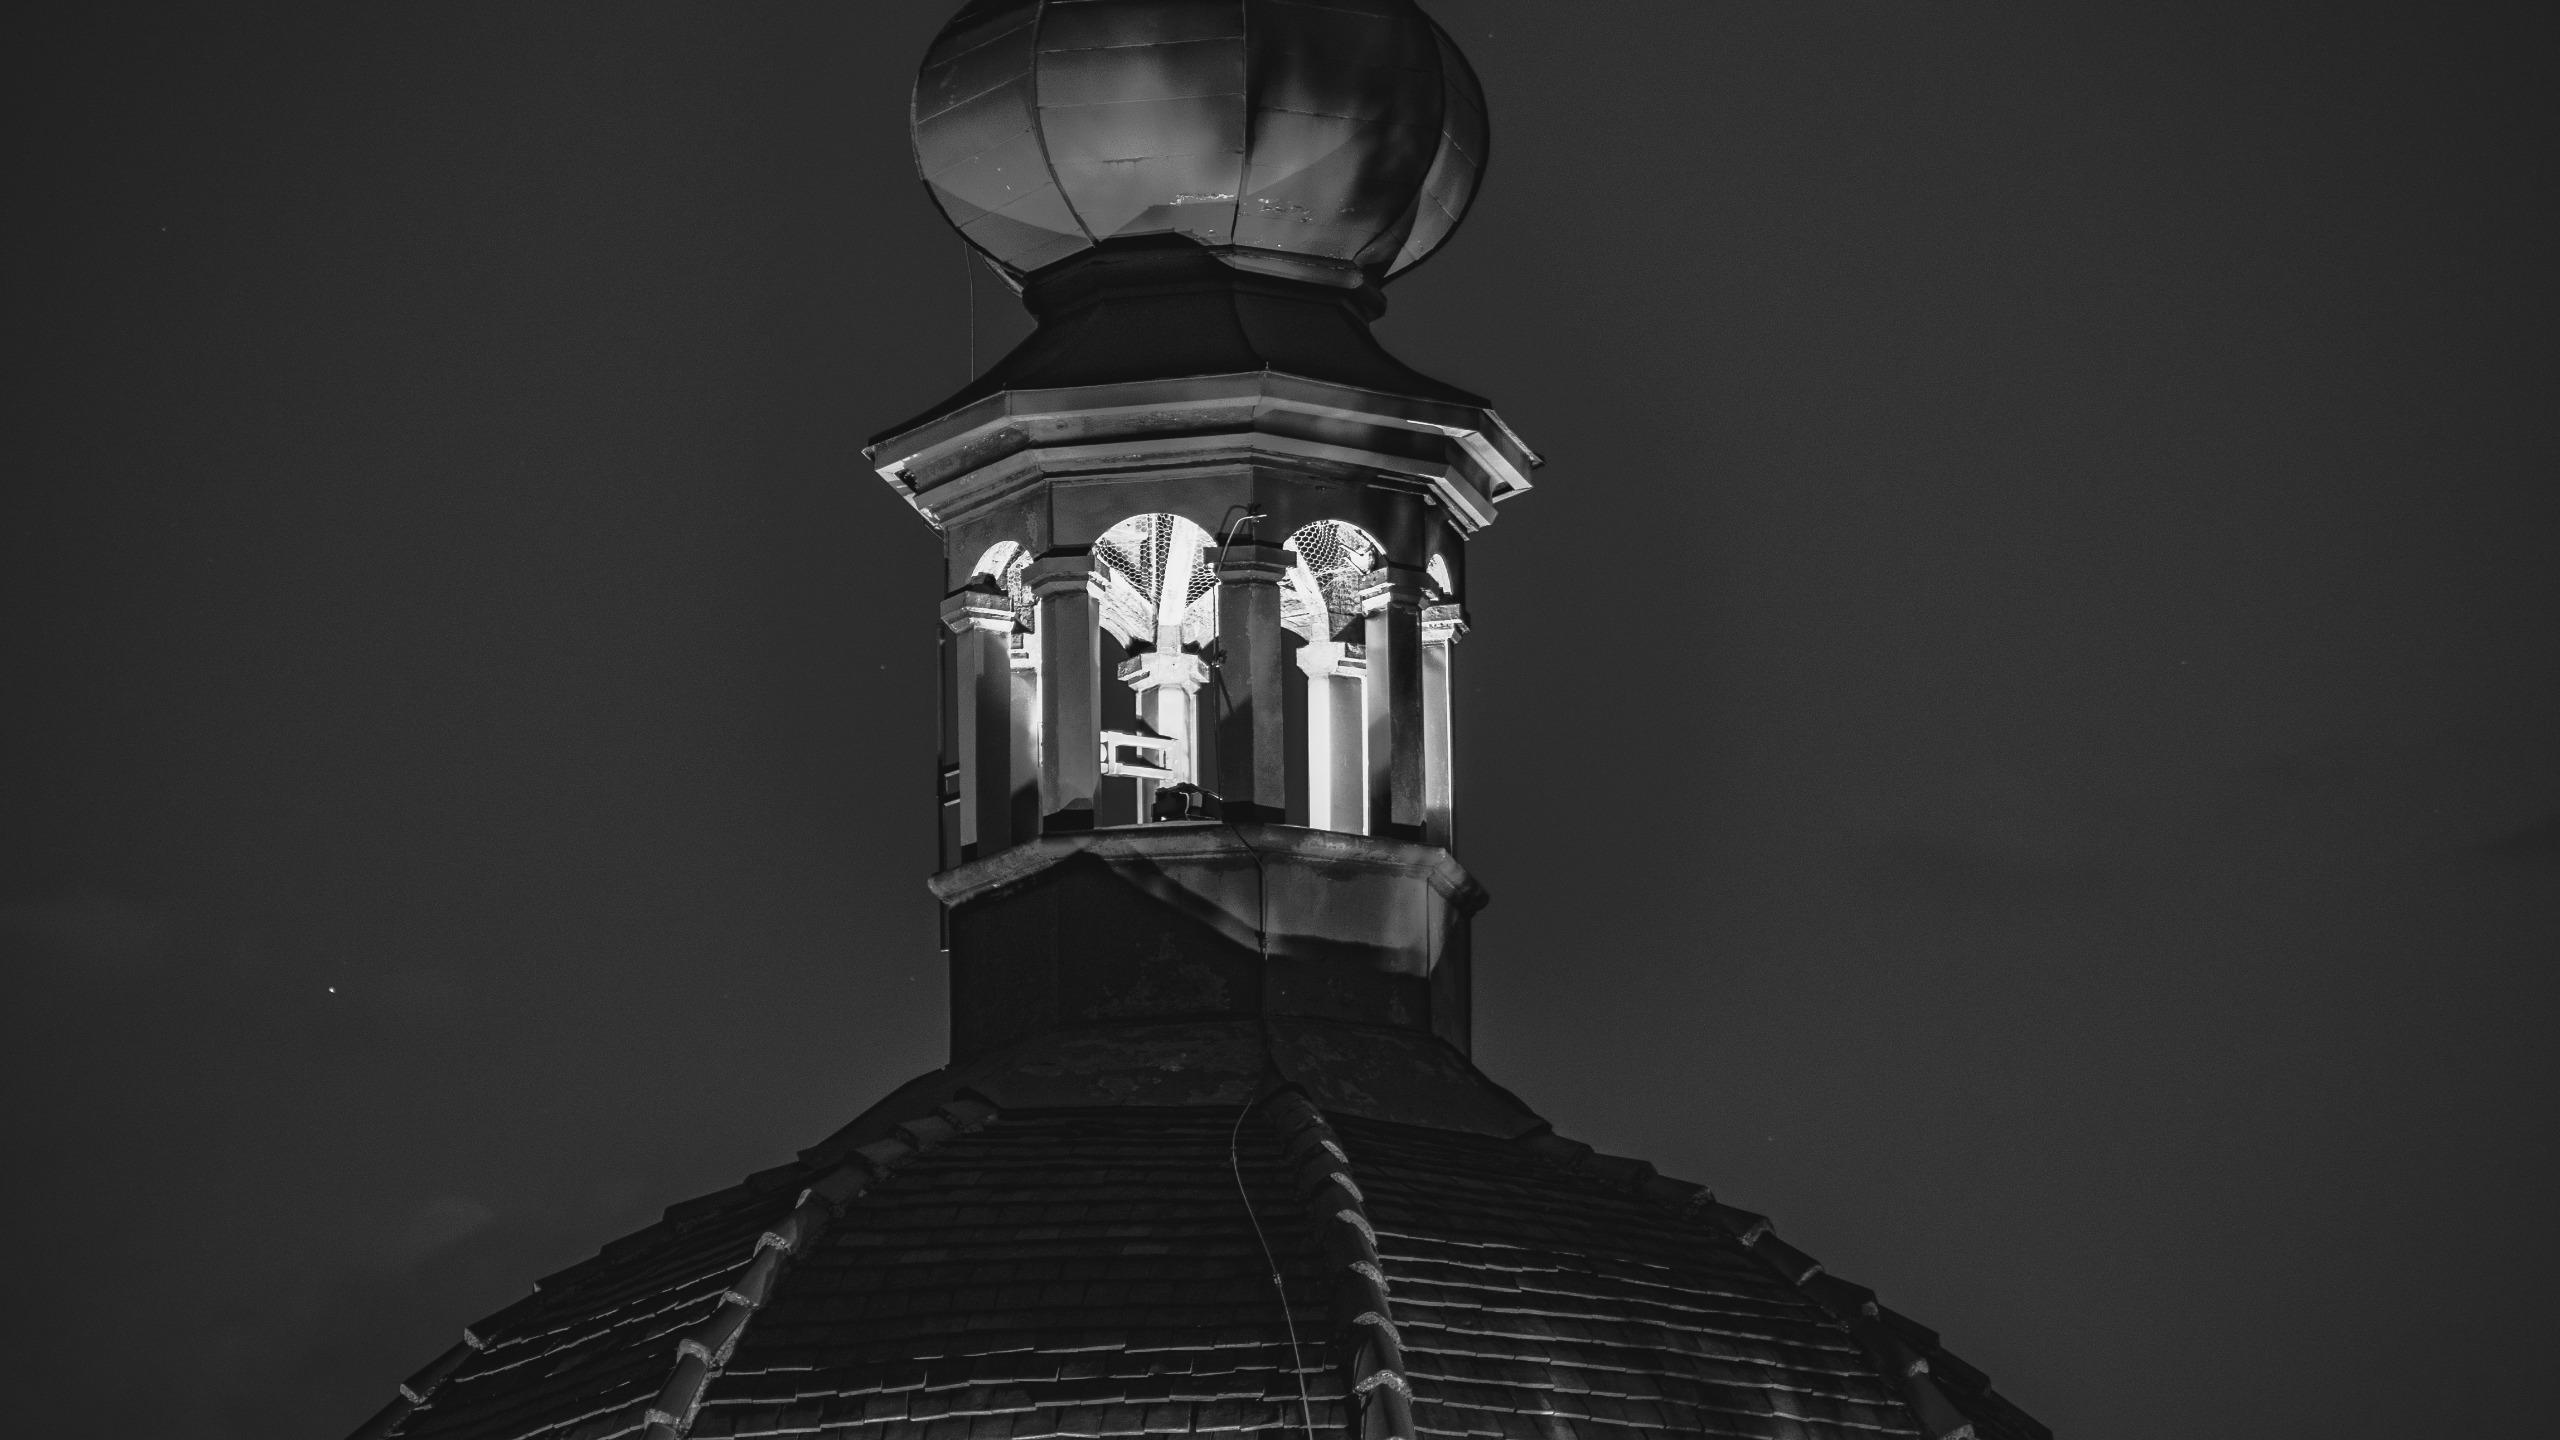 Glockenturm – Liesl Graz - blackandwhitephotography - marcstipsits | ello